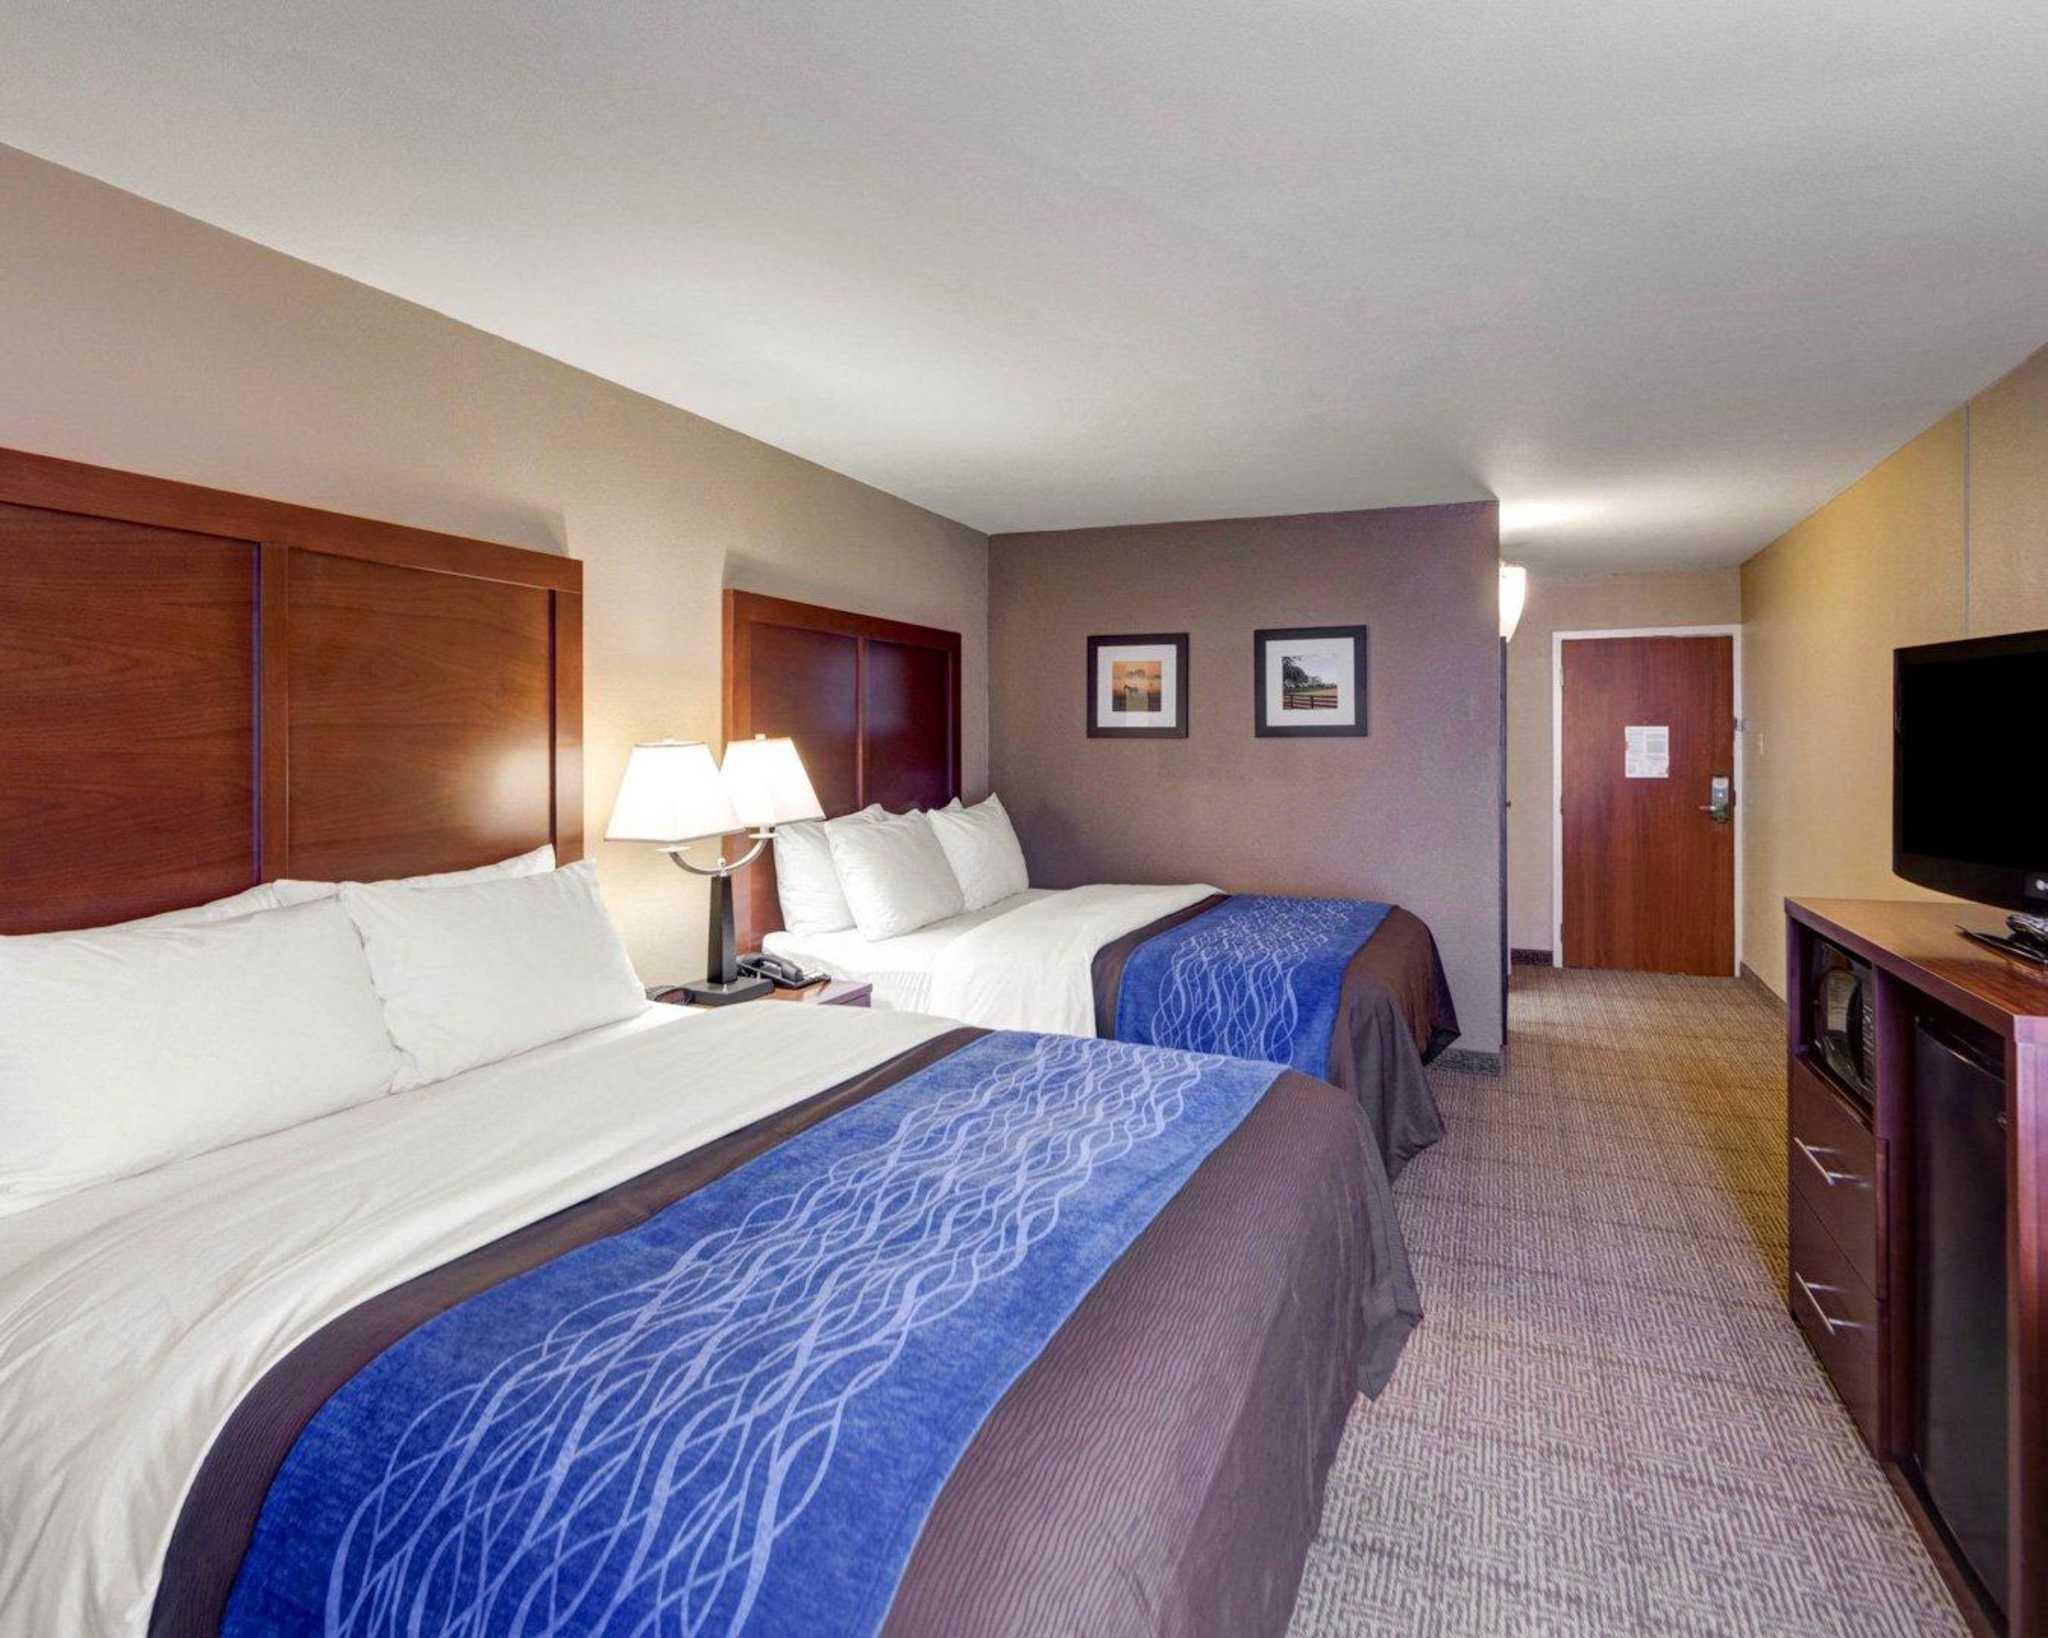 Comfort Inn & Suites Plano East image 10